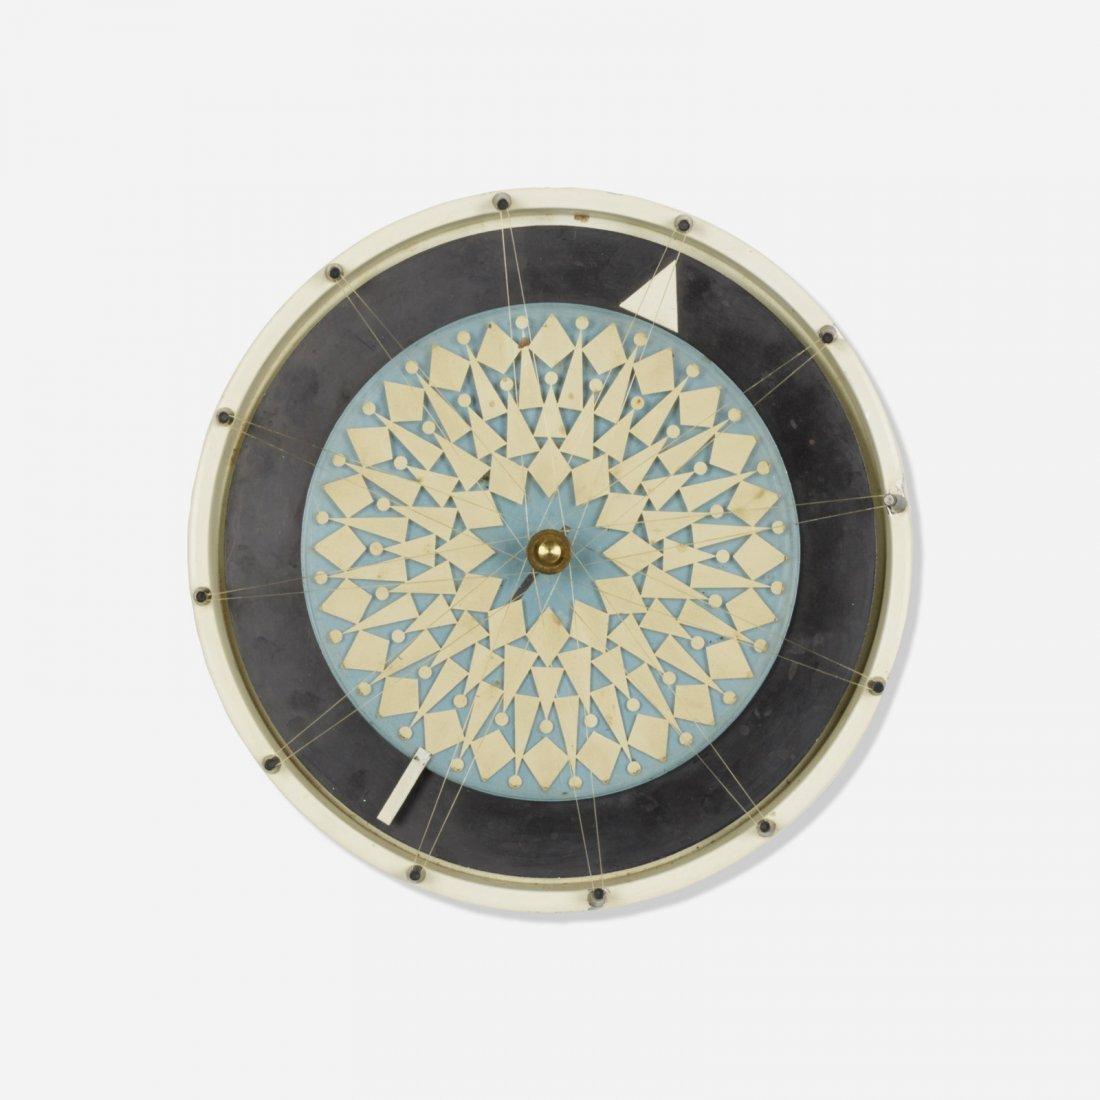 George Nelson & Assoc., Compass wall clock, model 2278 - 2